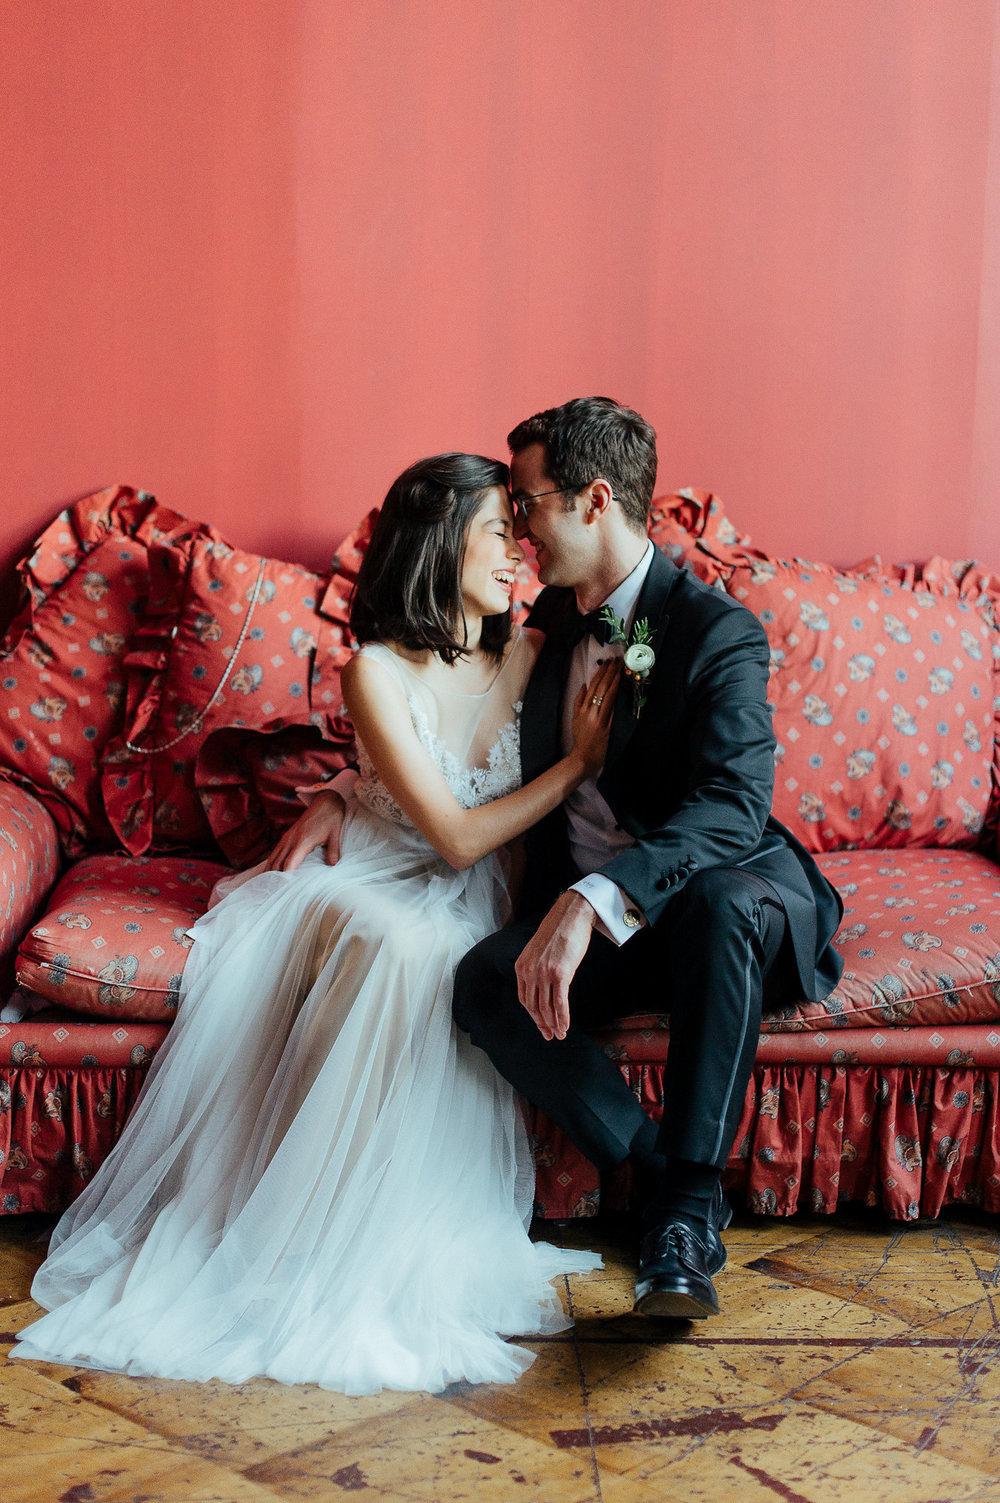 wedding_portraits_details26.JPG